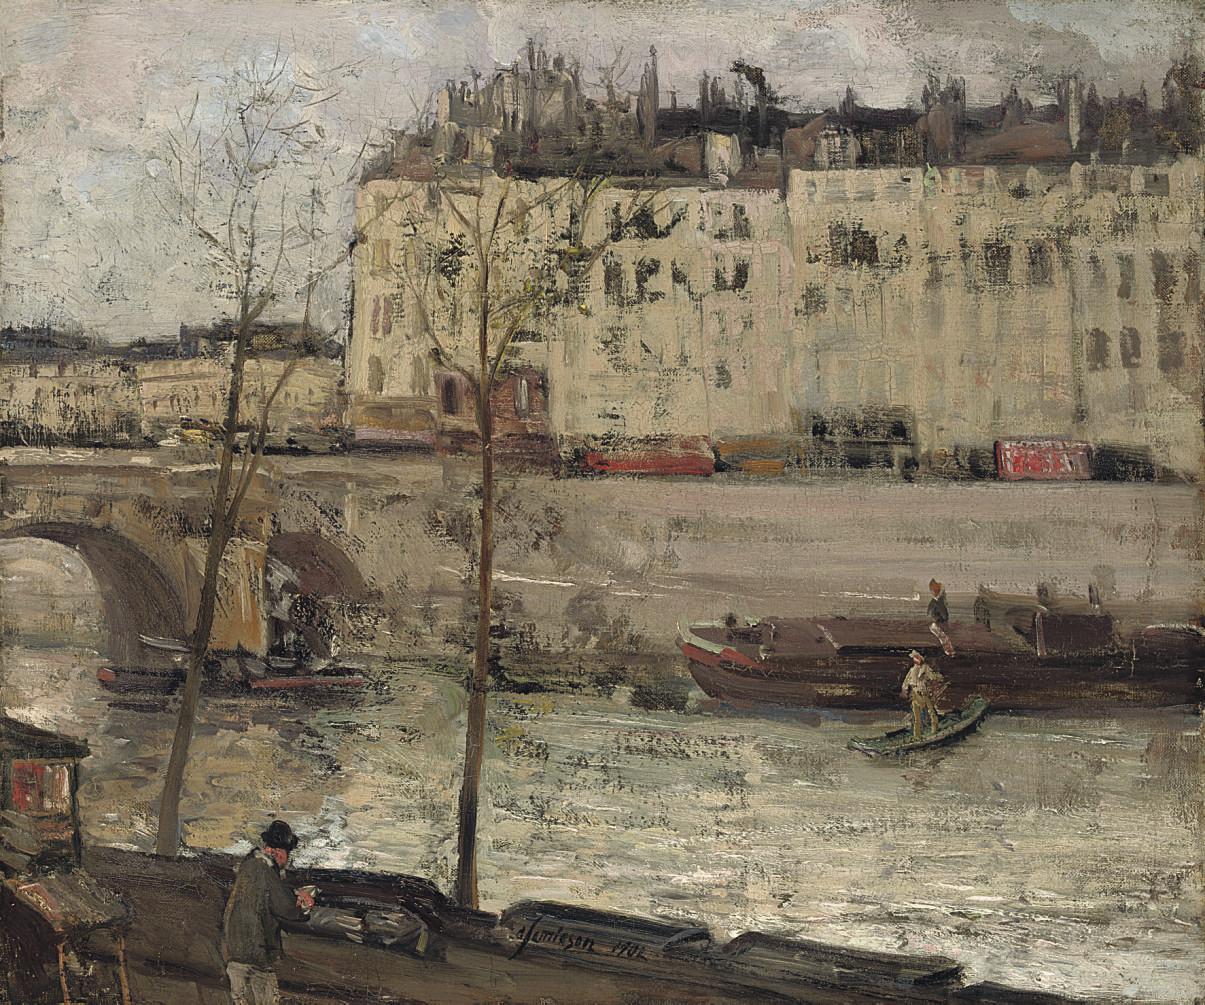 Boats on the Seine, Paris